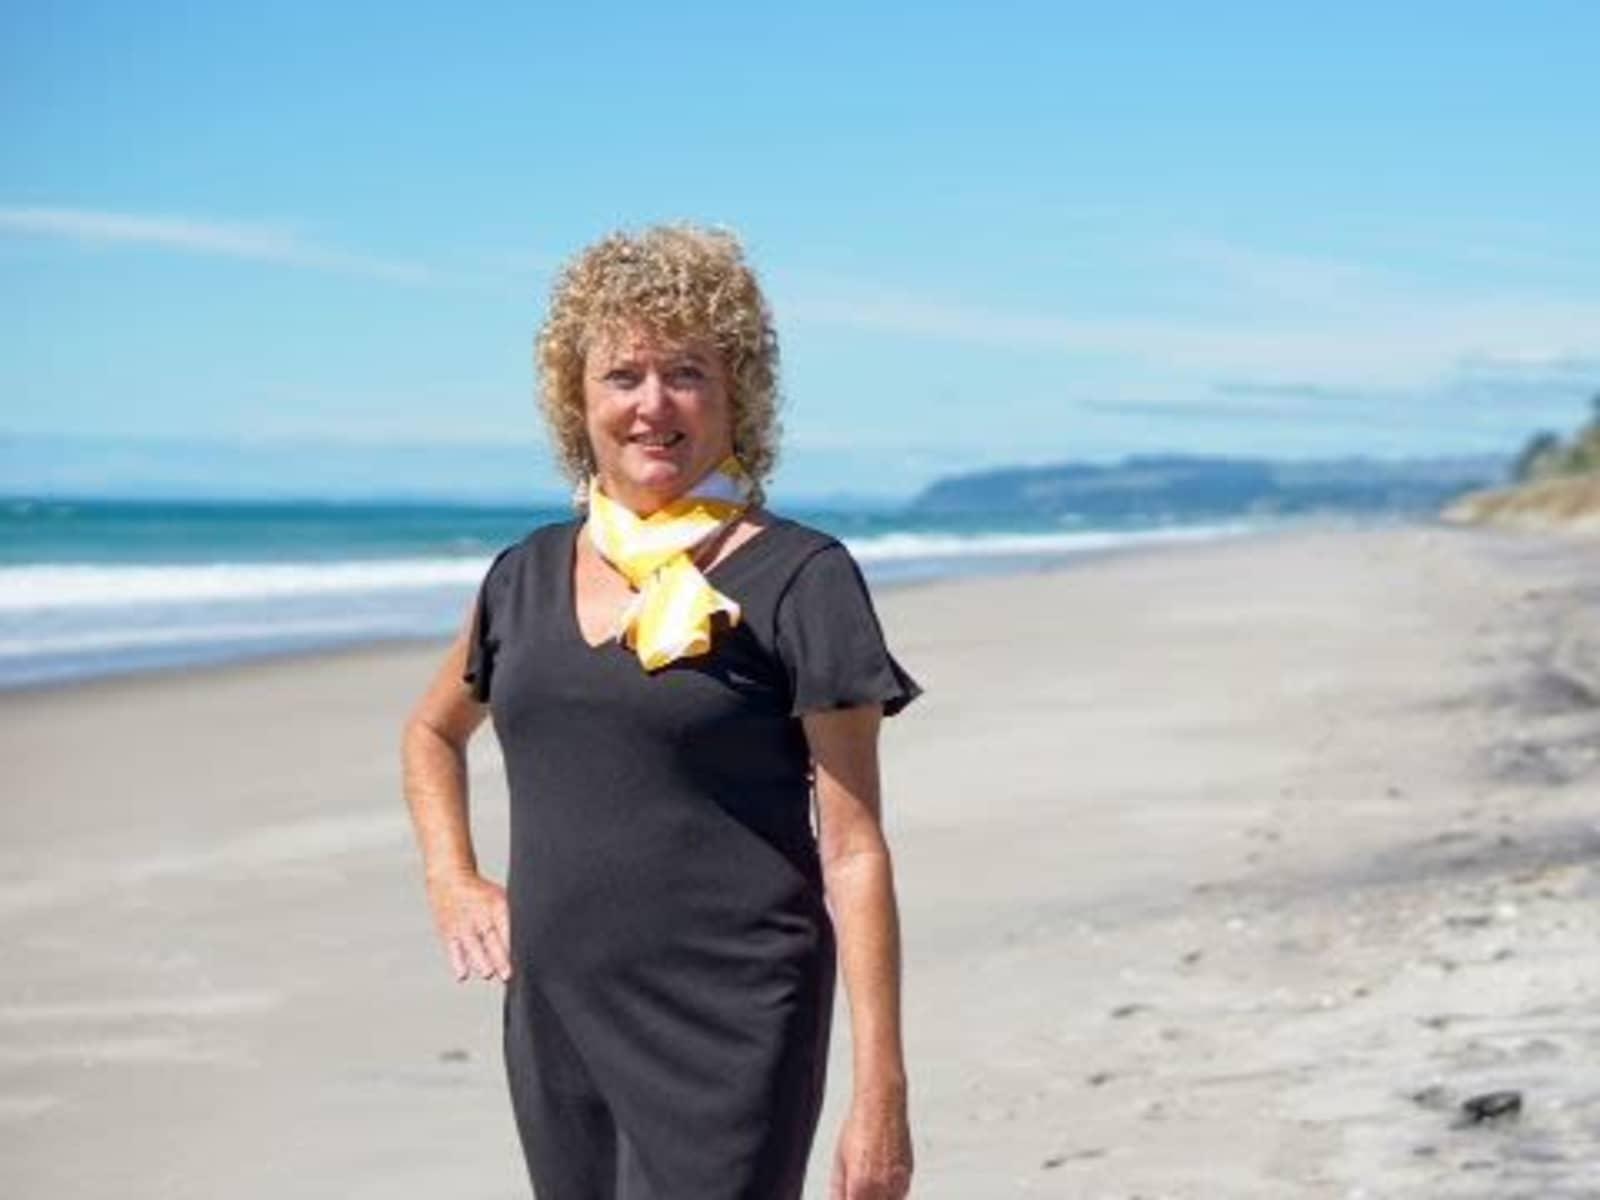 Joy from Pukehina, New Zealand